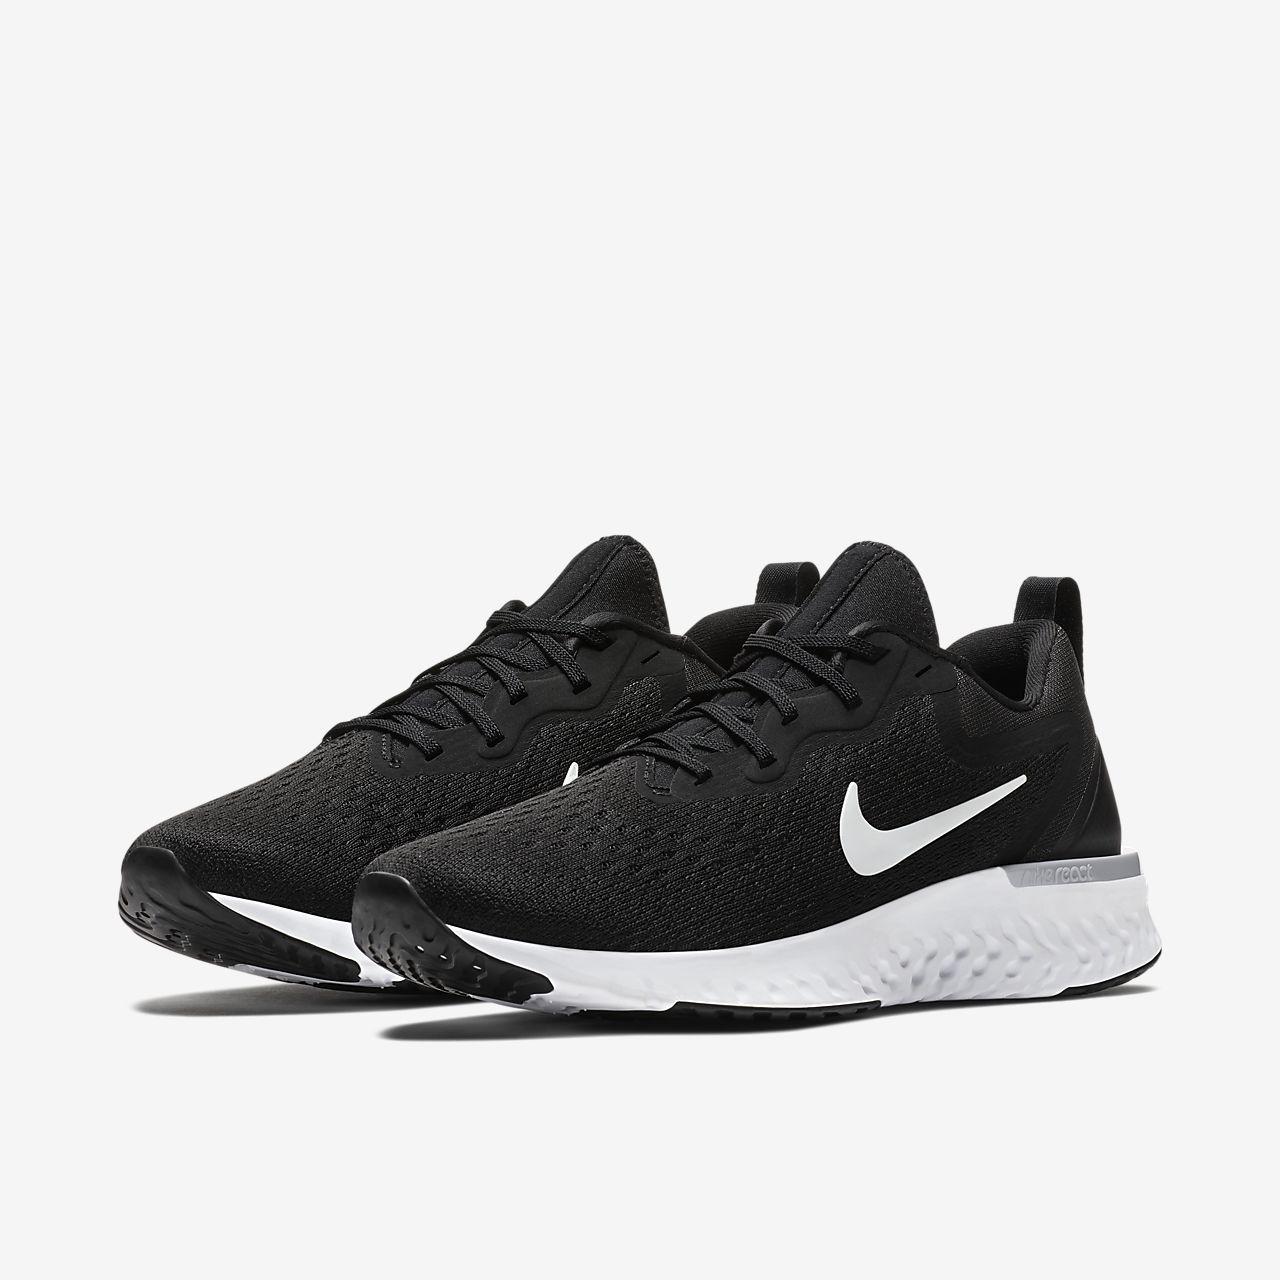 Nike Zoom Odyssey Taglia 5 Running Scarpe da Ginnastica da Donna Scarpa da corsa Blues RRP 100/